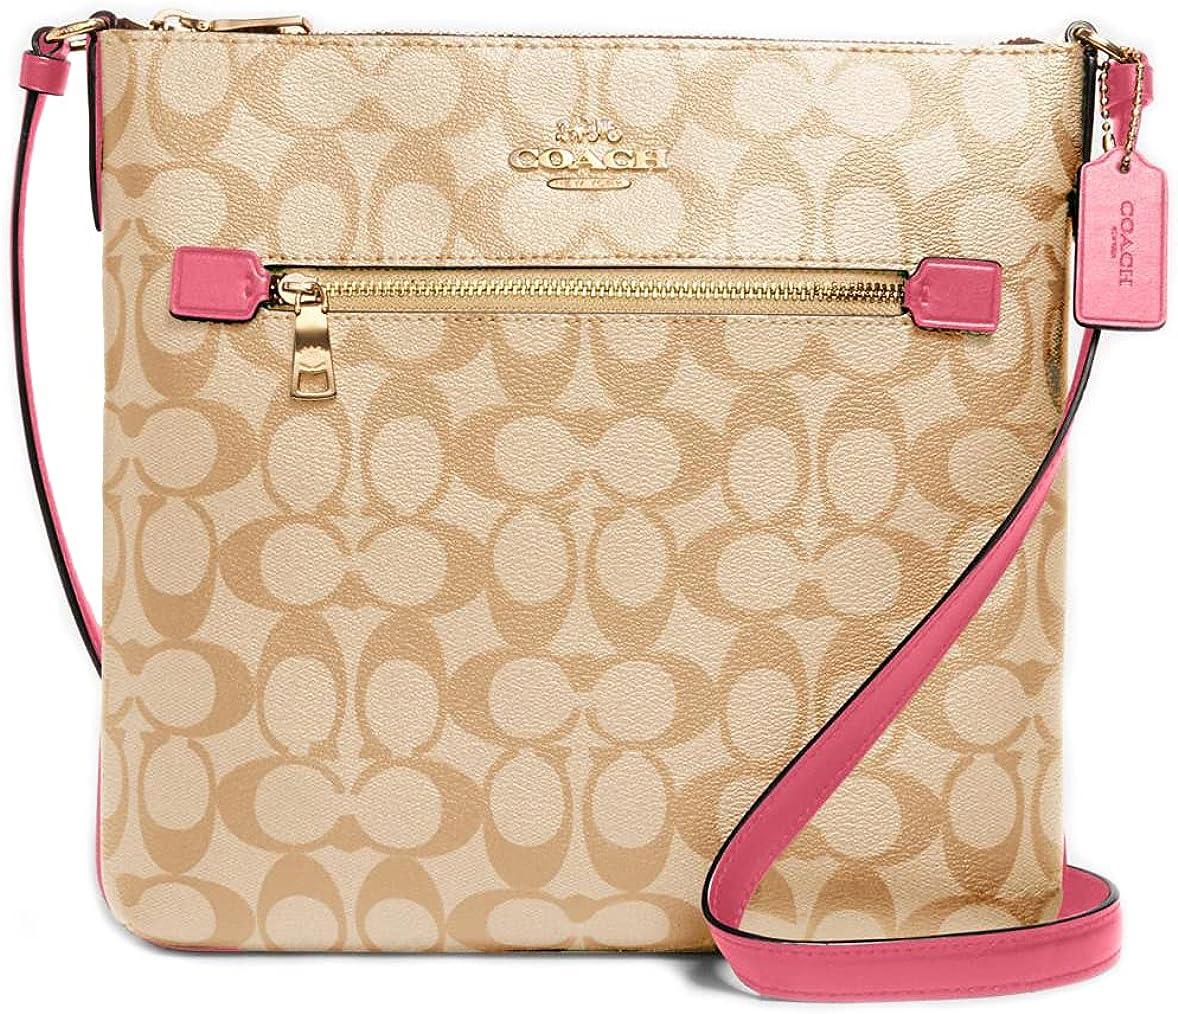 Coach Rowan File Bag In Signature Canvas C1554 Im/Light Khaki/Confetti Pink